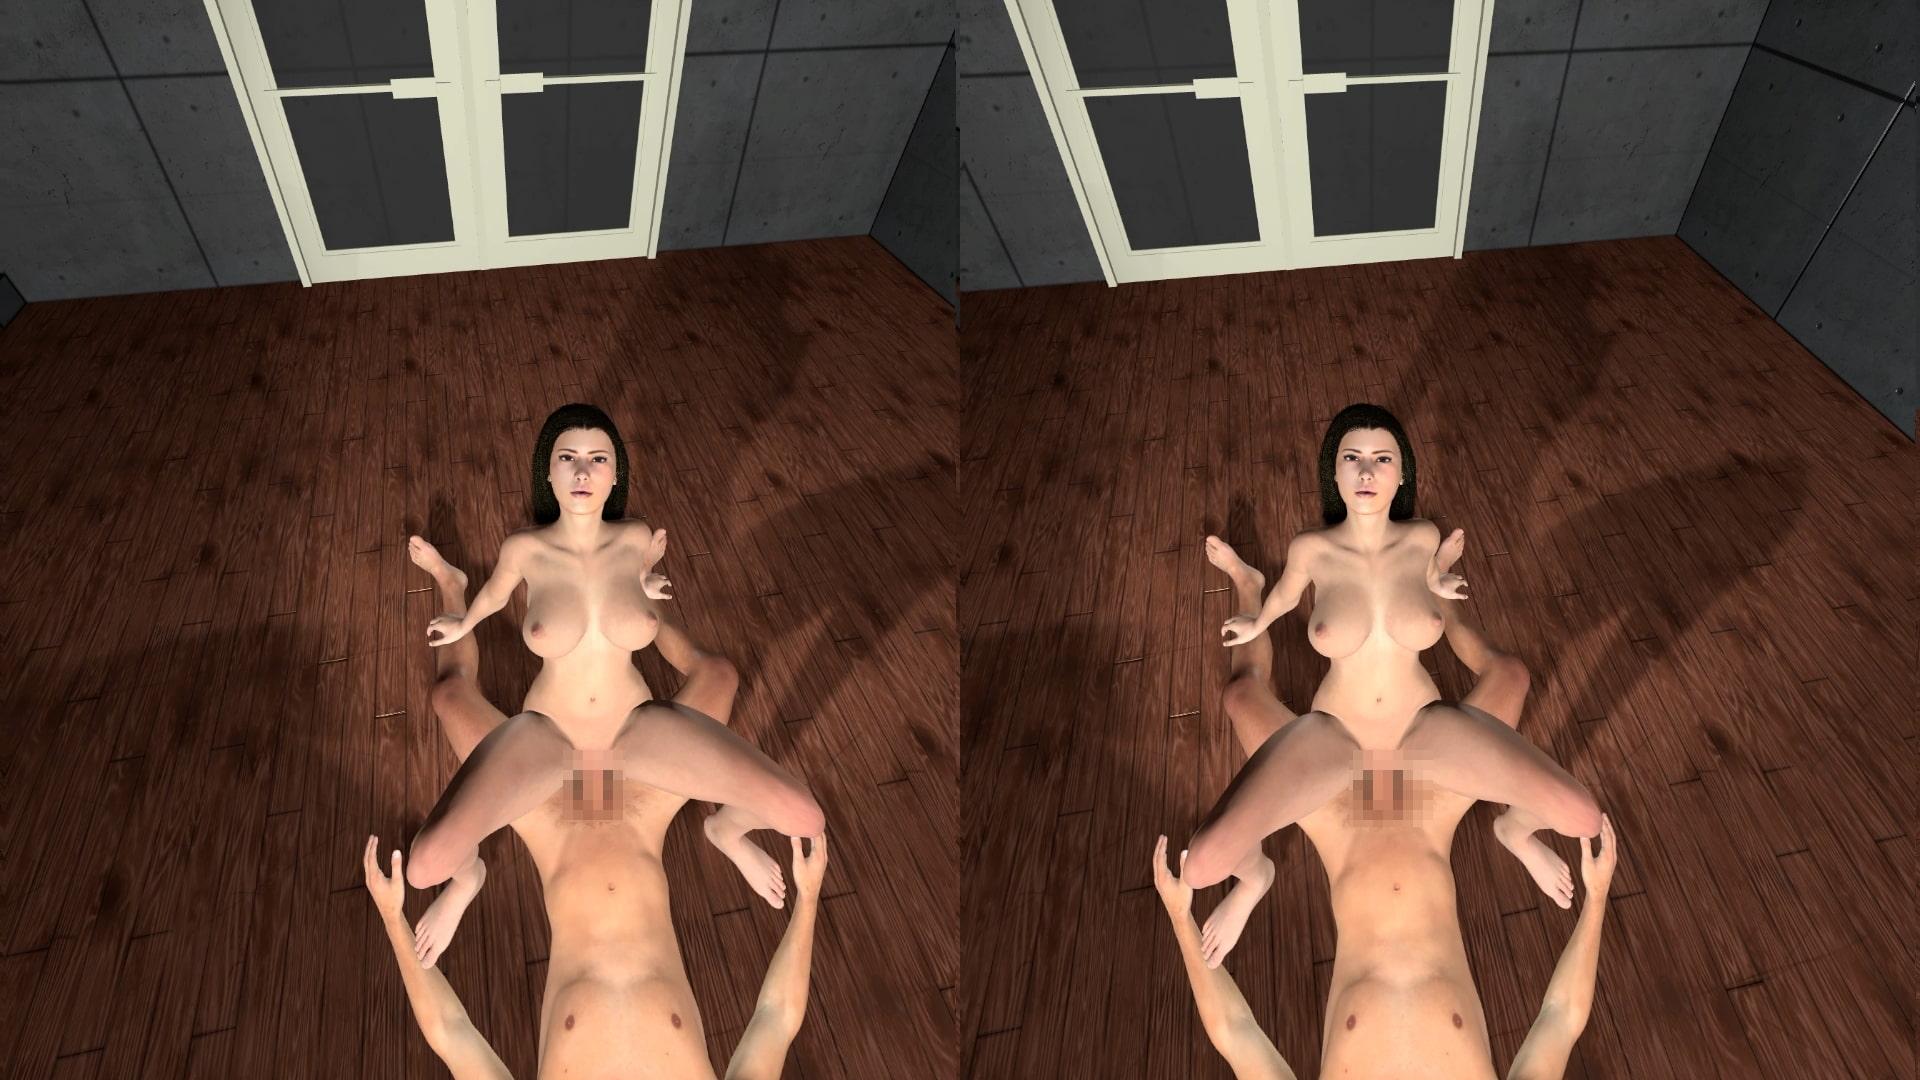 RJ316838 On The Man On The Floor [20210219]